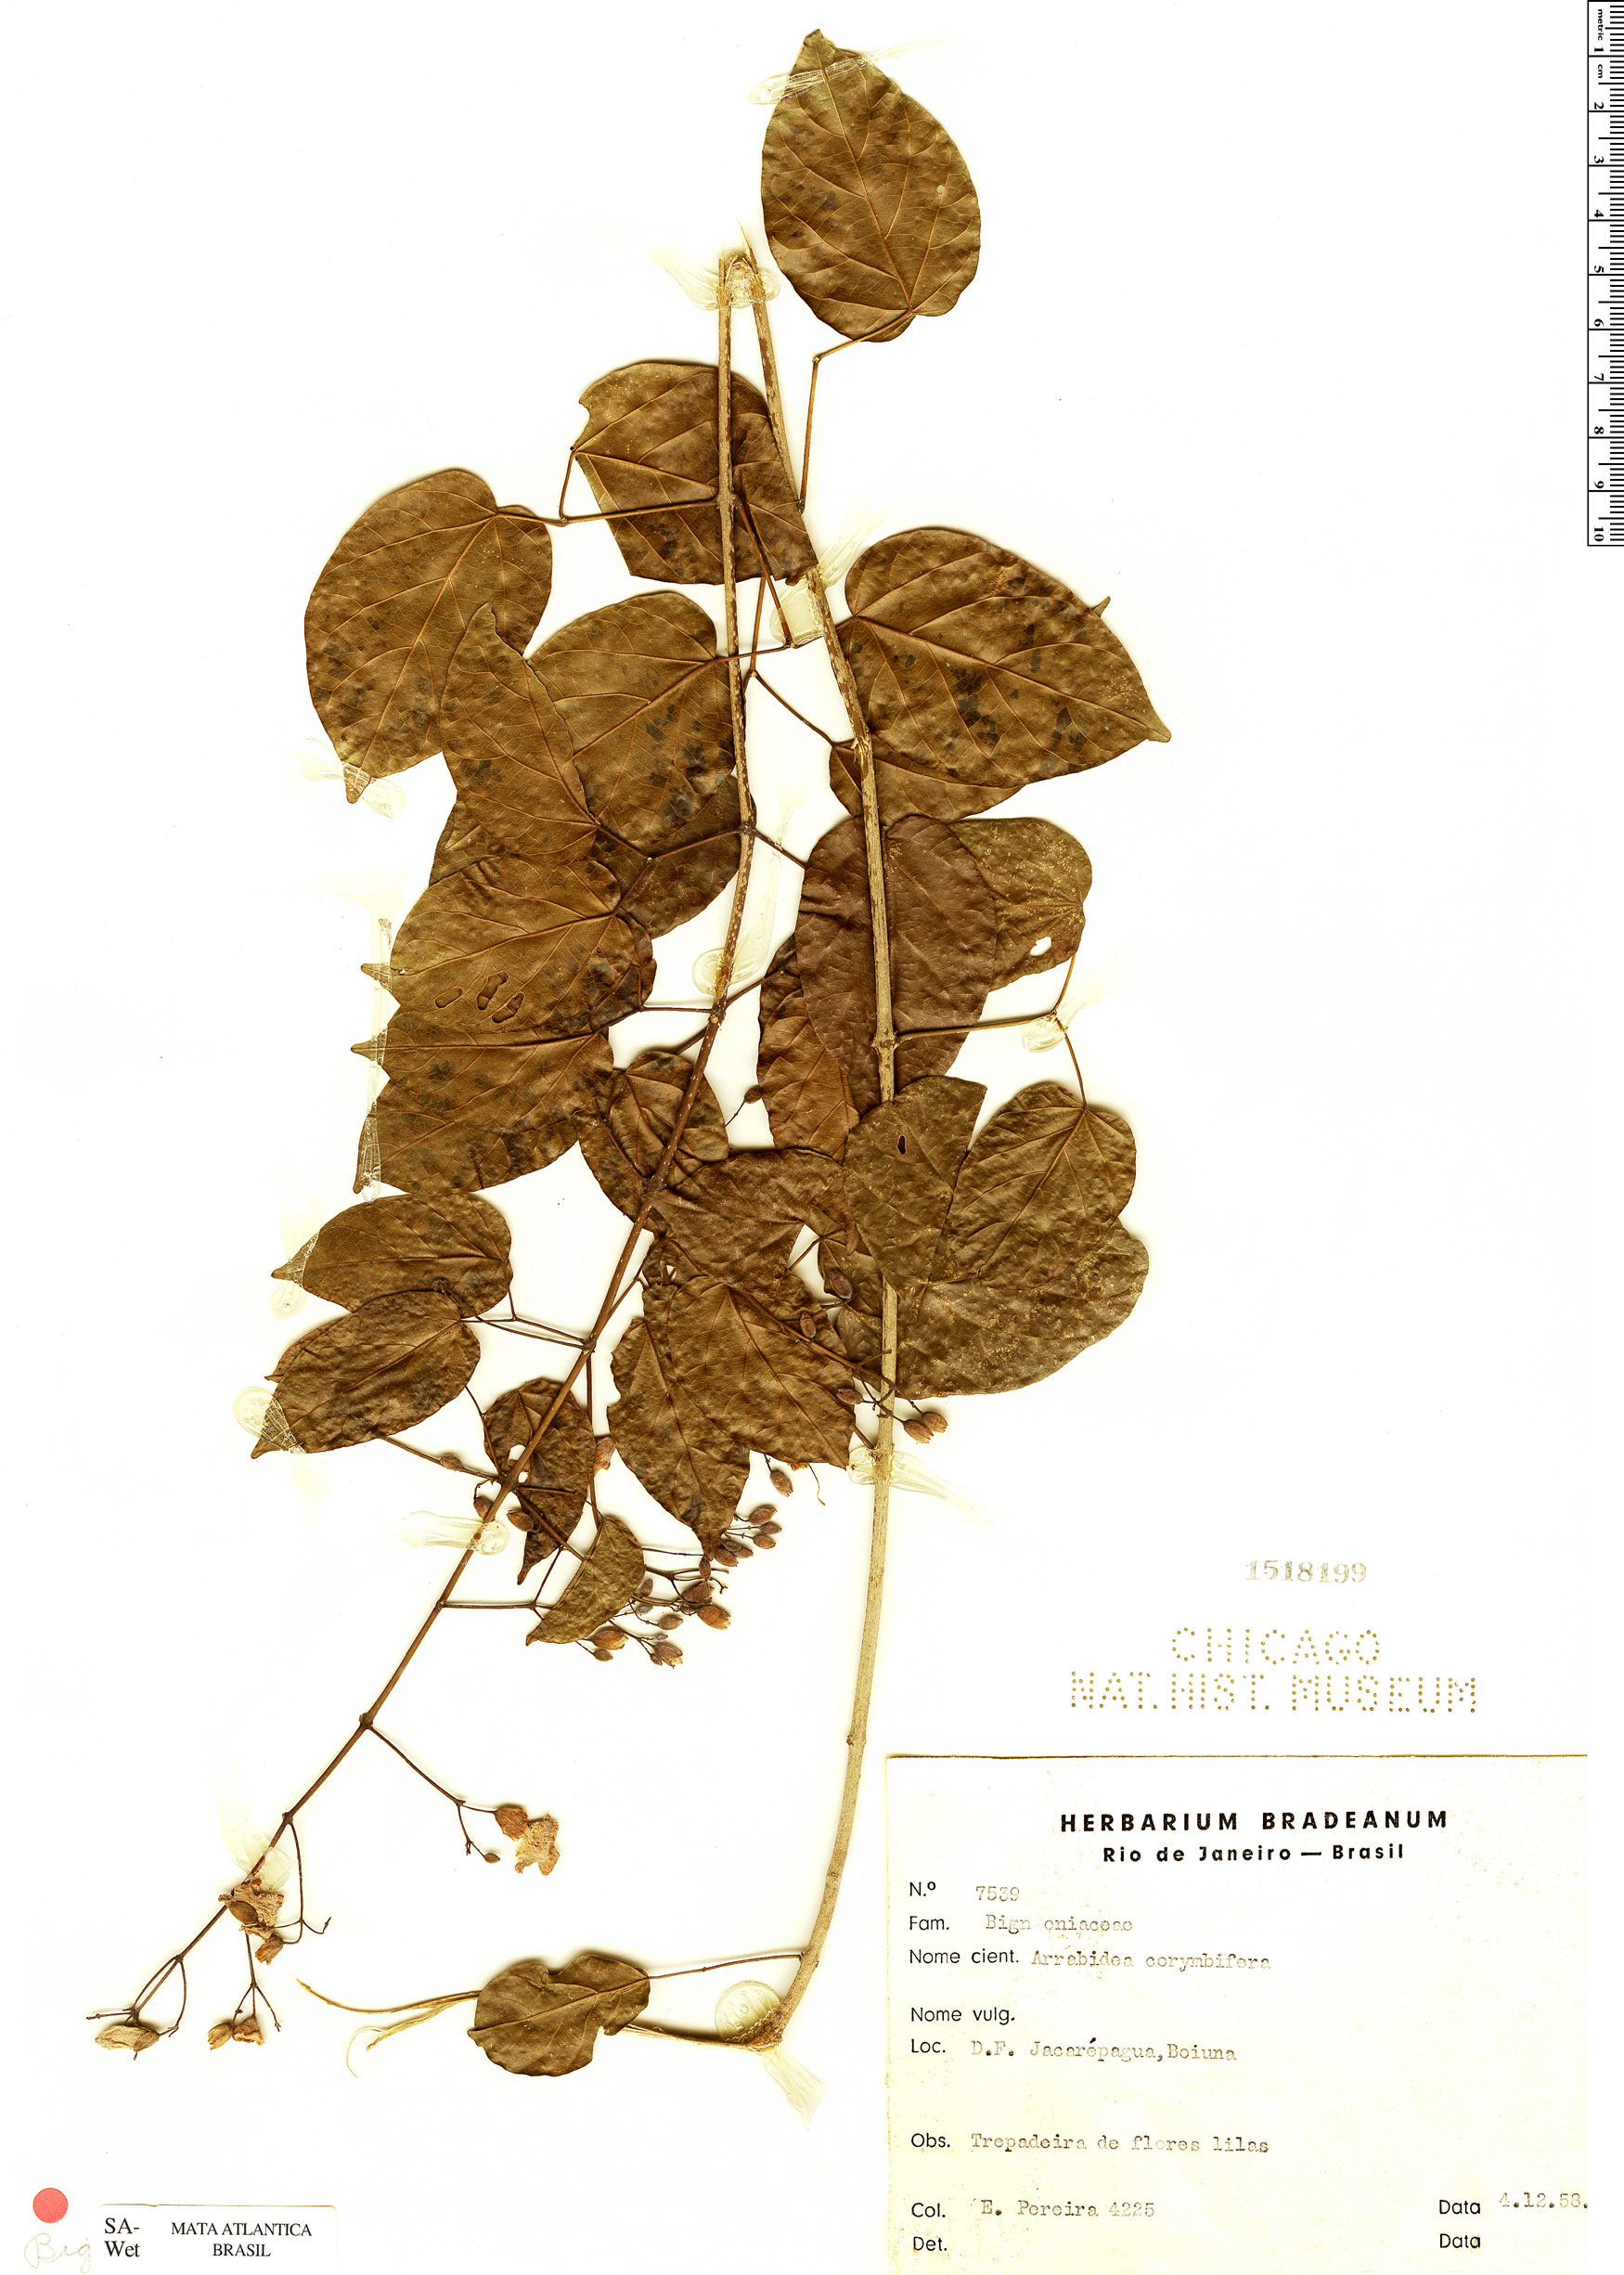 Espécime: Lundia corymbifera